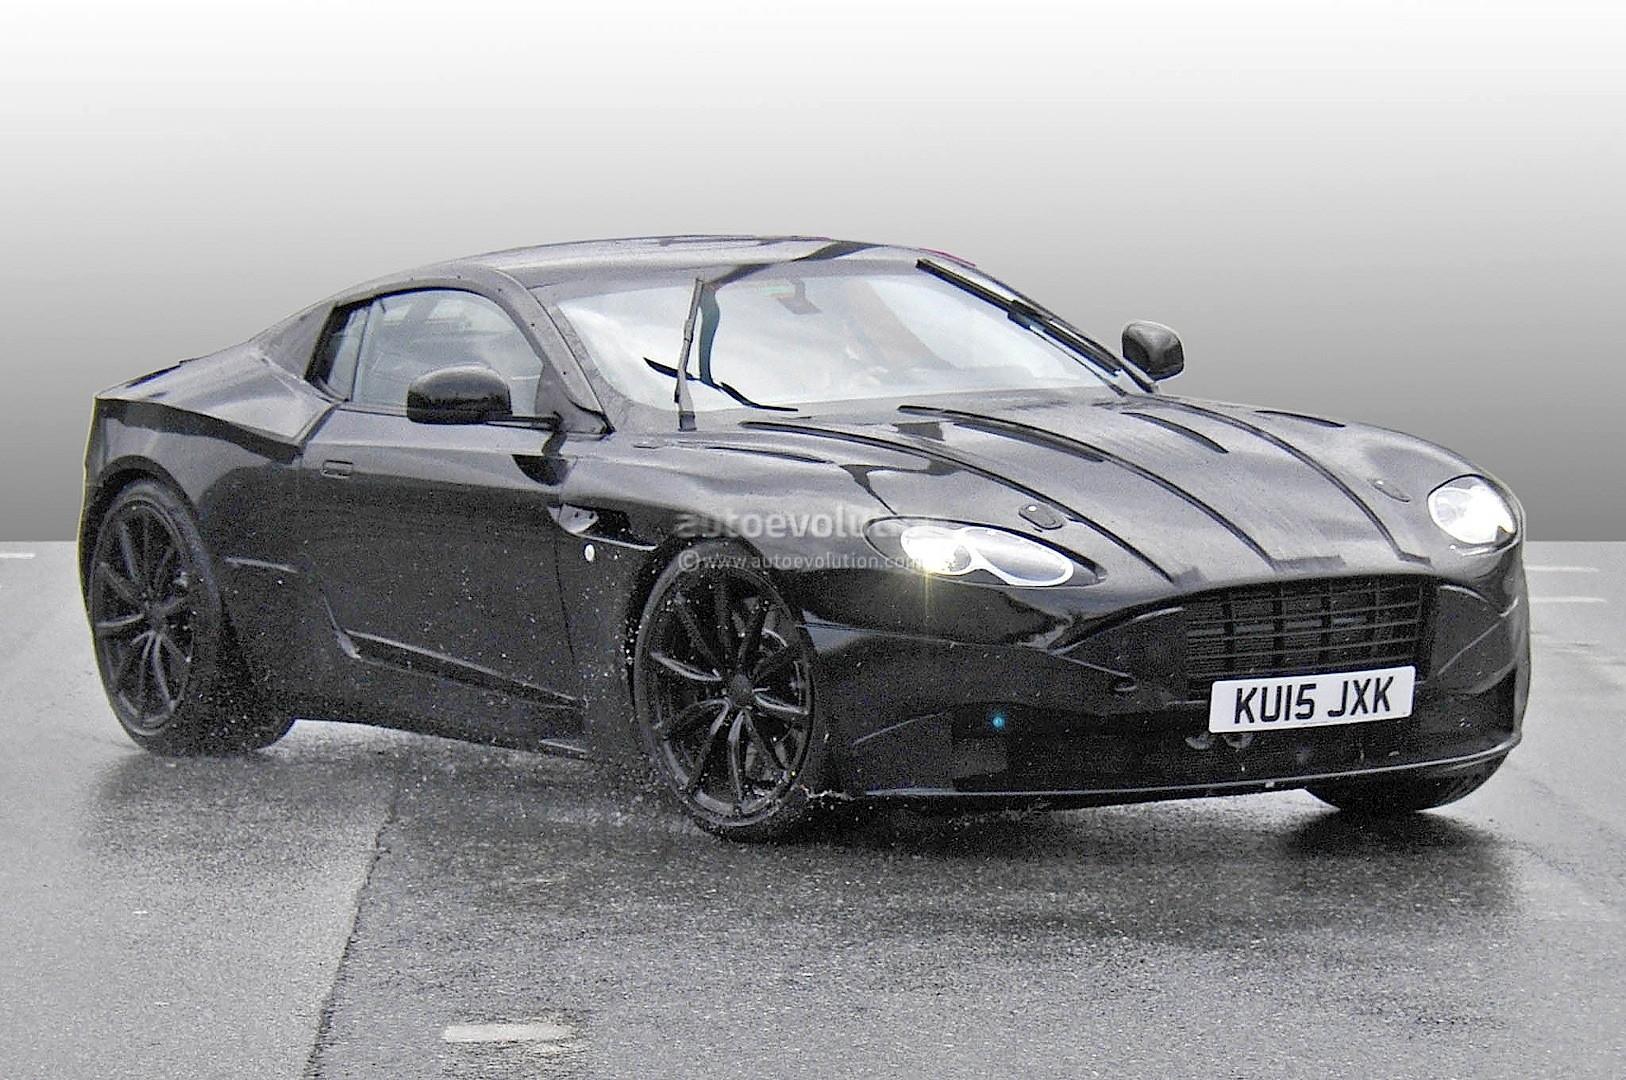 2016 - [Aston Martin] DB11 2017-aston-martin-db9-successor-prototype-spyshots-show-db10-like-silhouette-digital-dashboard-intercoolers_1